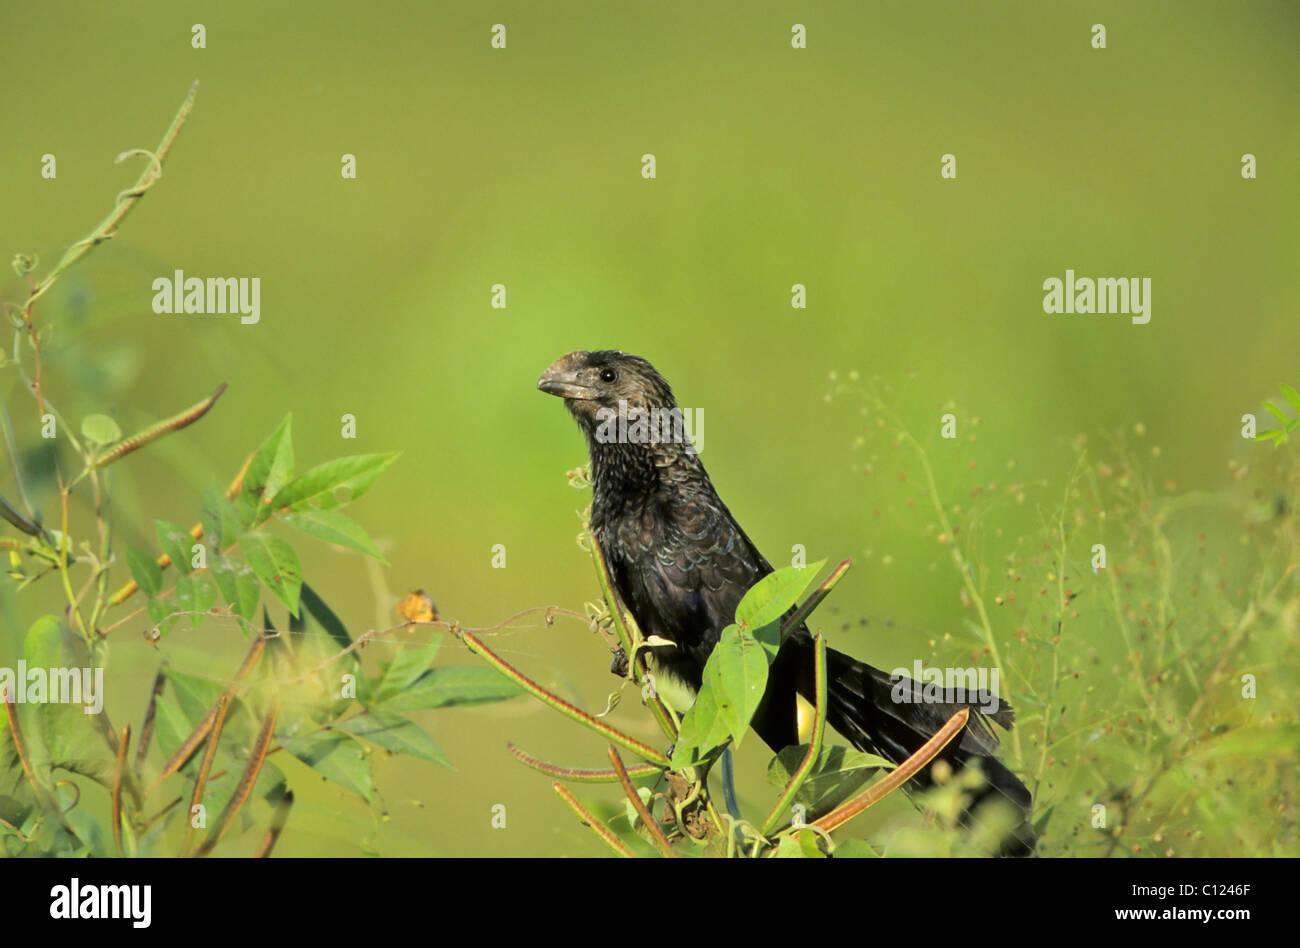 Smooth-billed Ani (Crotophaga ani) - Stock Image